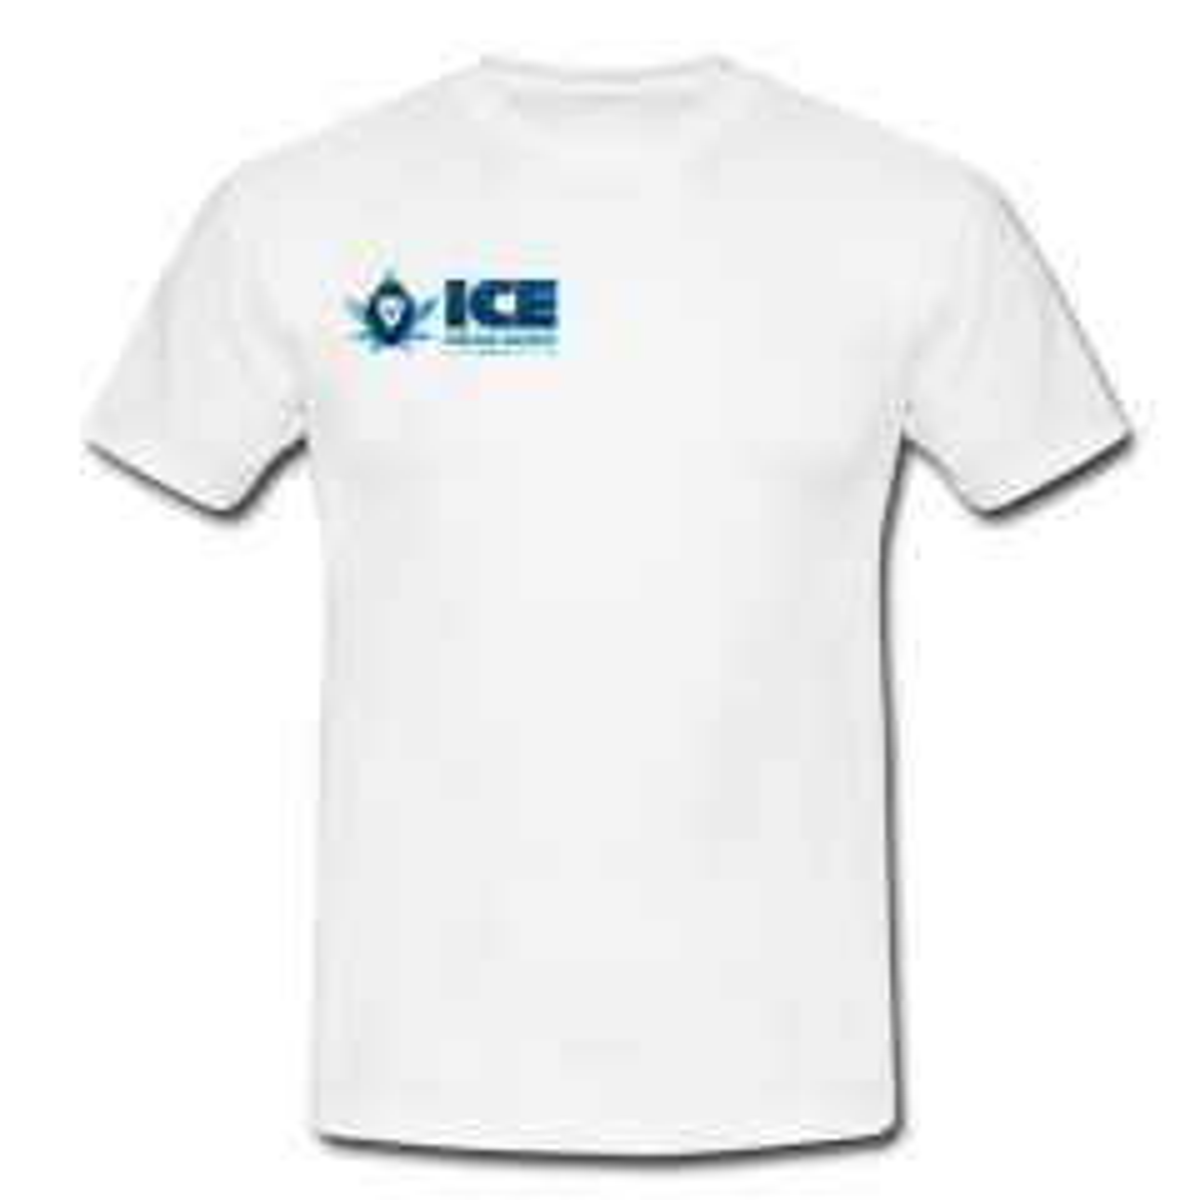 Mens ICE T shirt